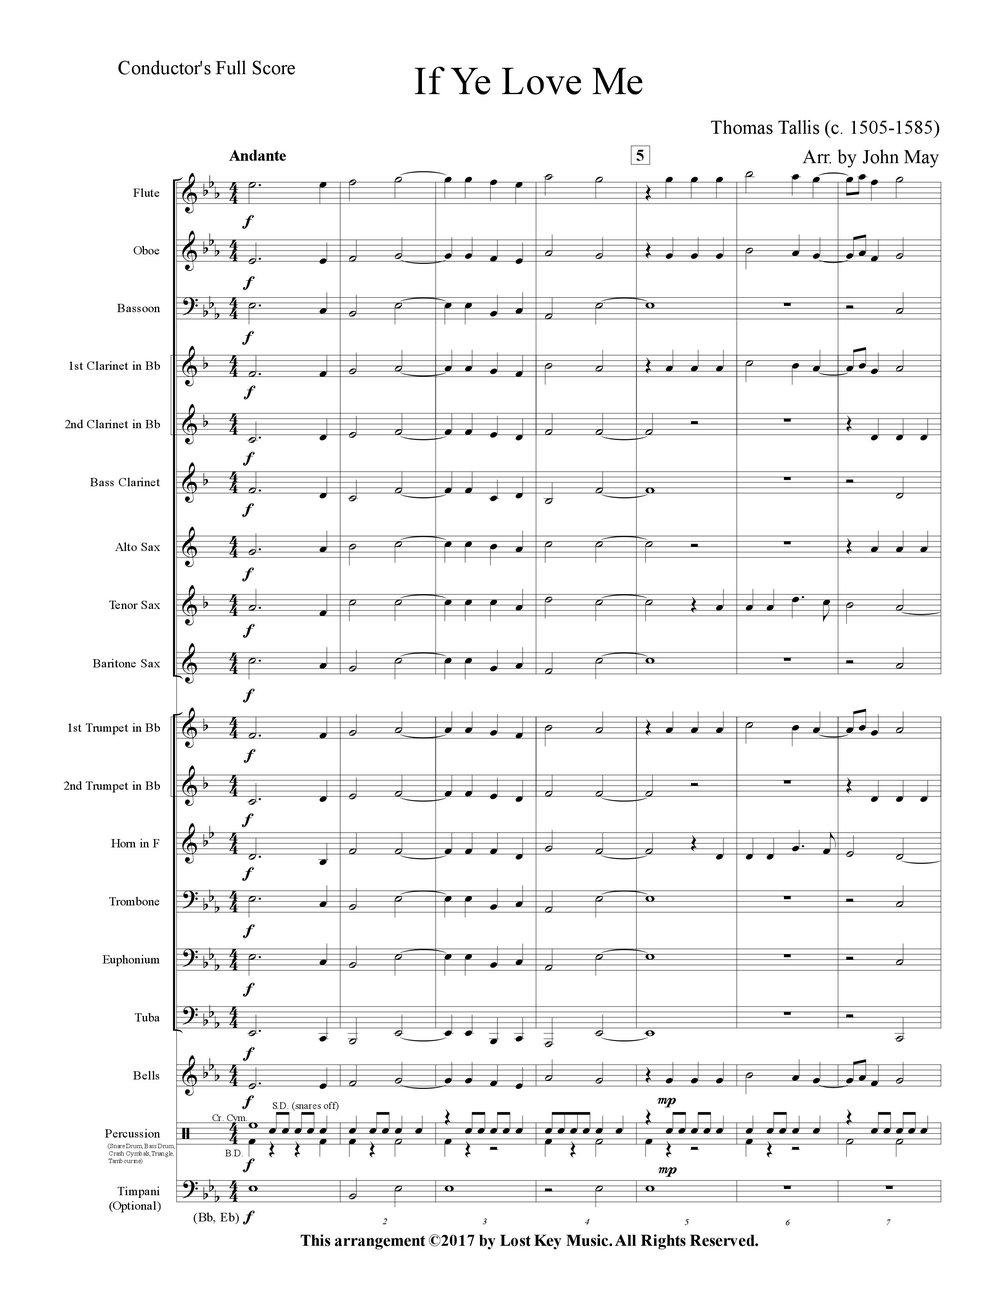 If Ye Love Me-Sample Score.jpg